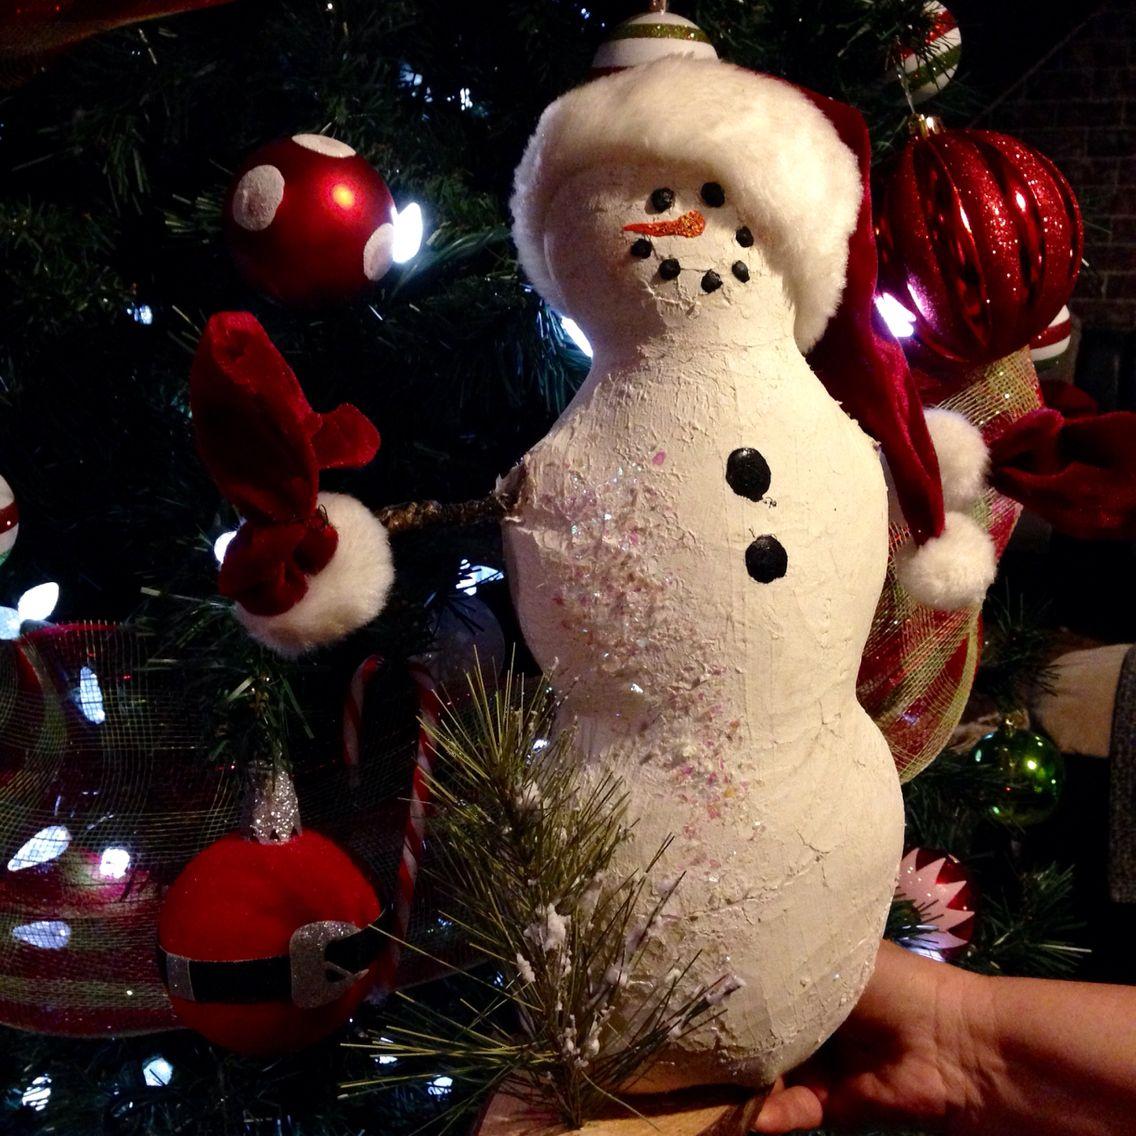 My little chubby glittery snowman